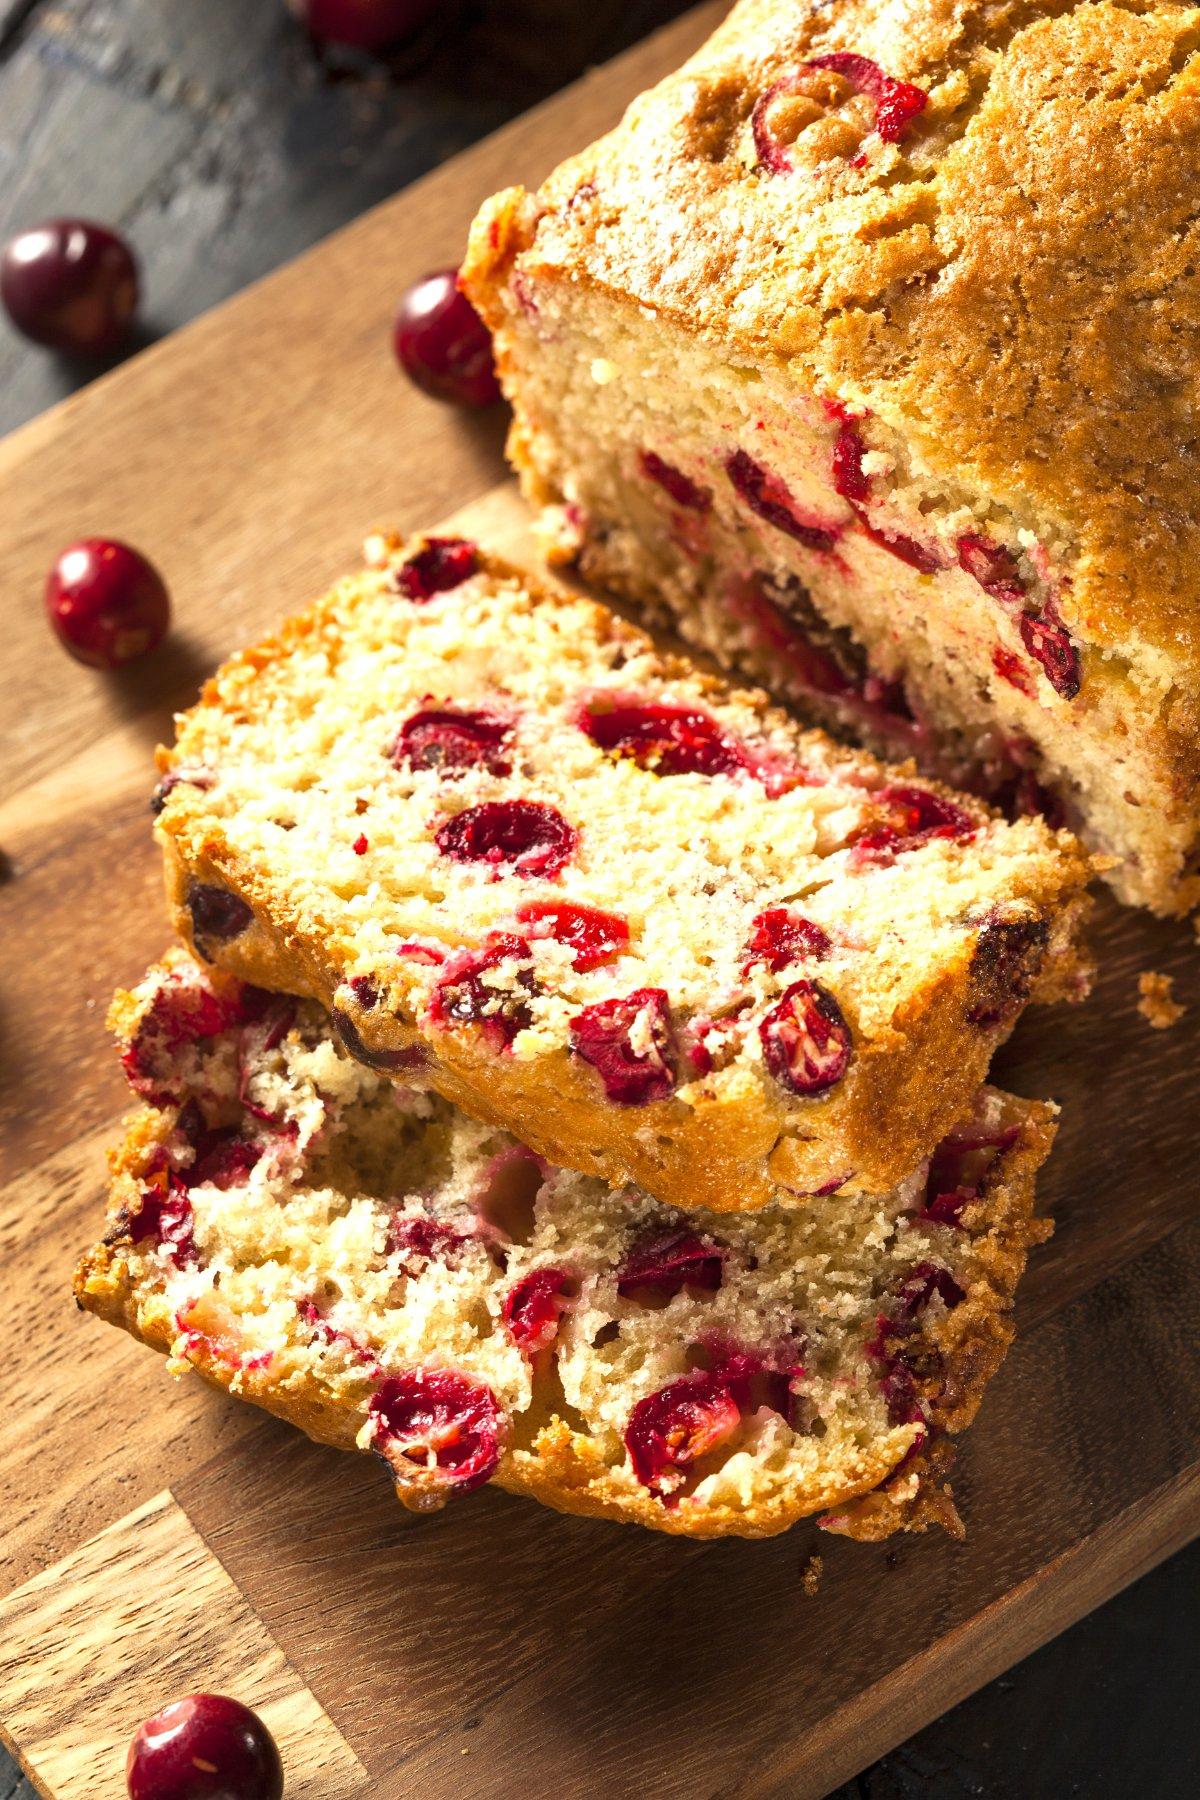 Vegan orange cranberry bread with fresh cranberries